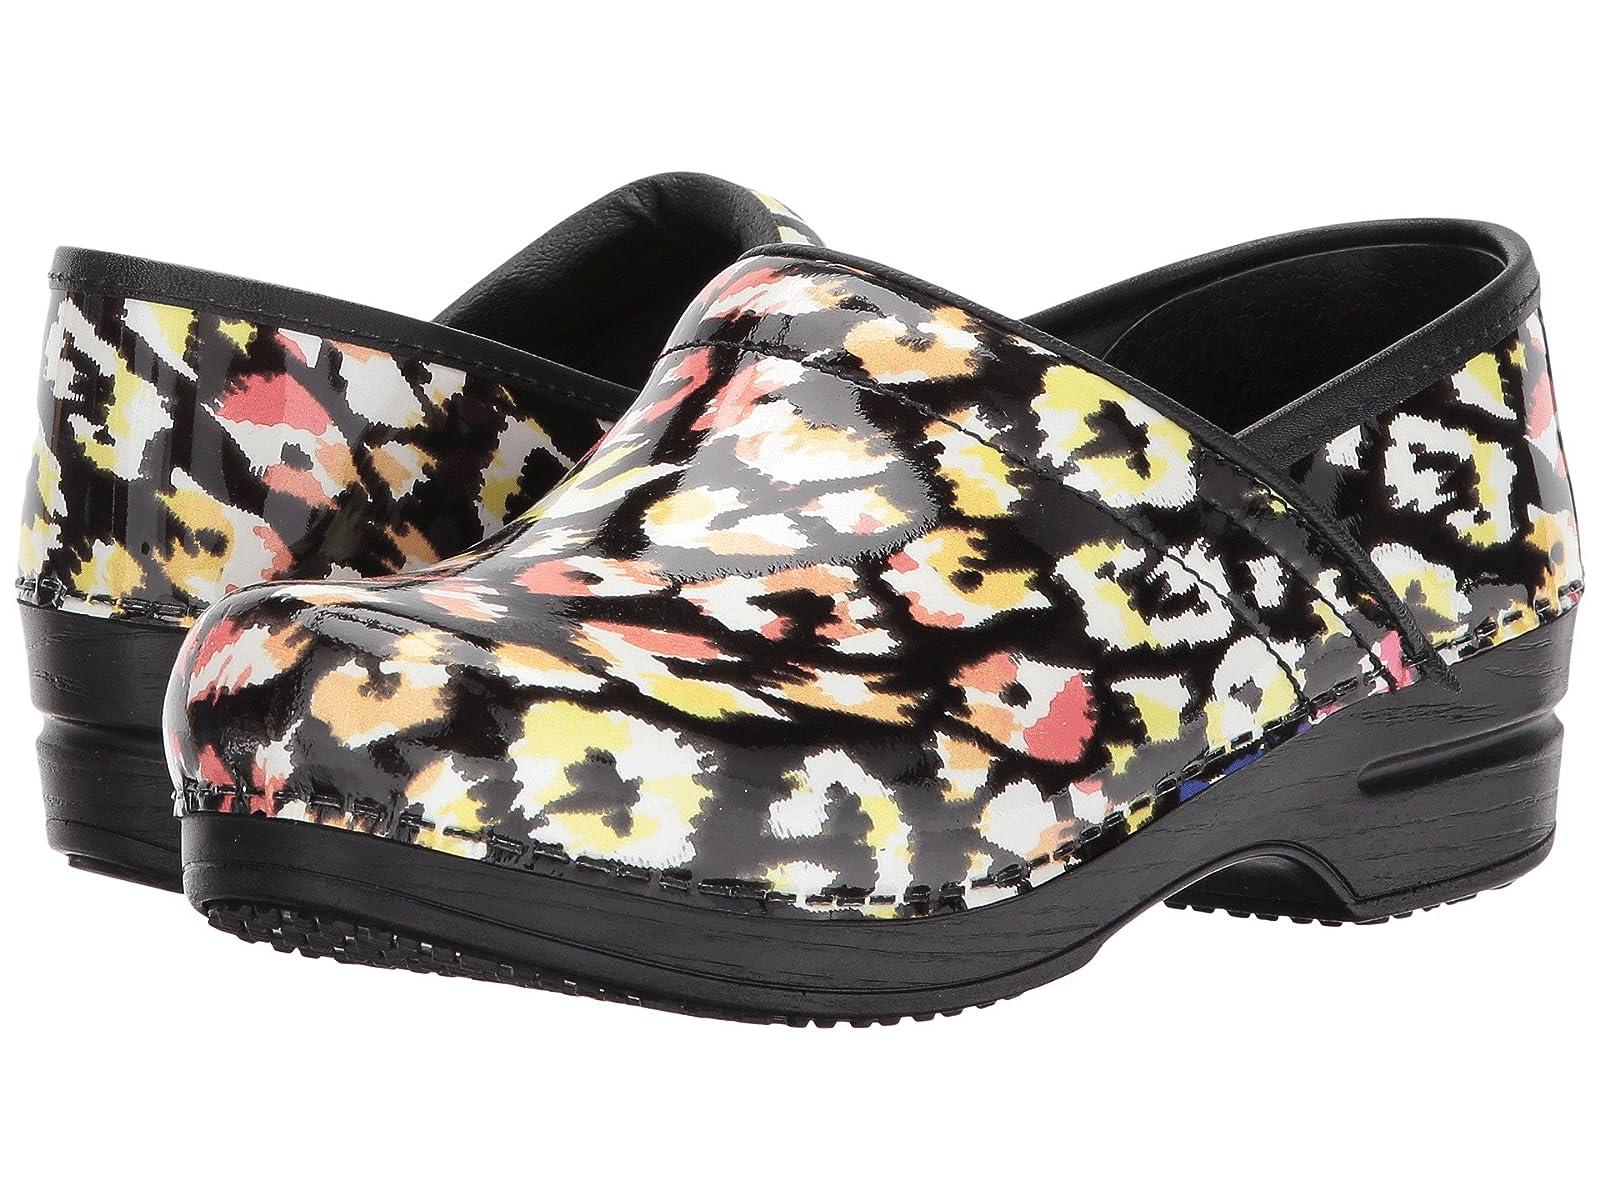 Sanita Smart Step SimoneCheap and distinctive eye-catching shoes